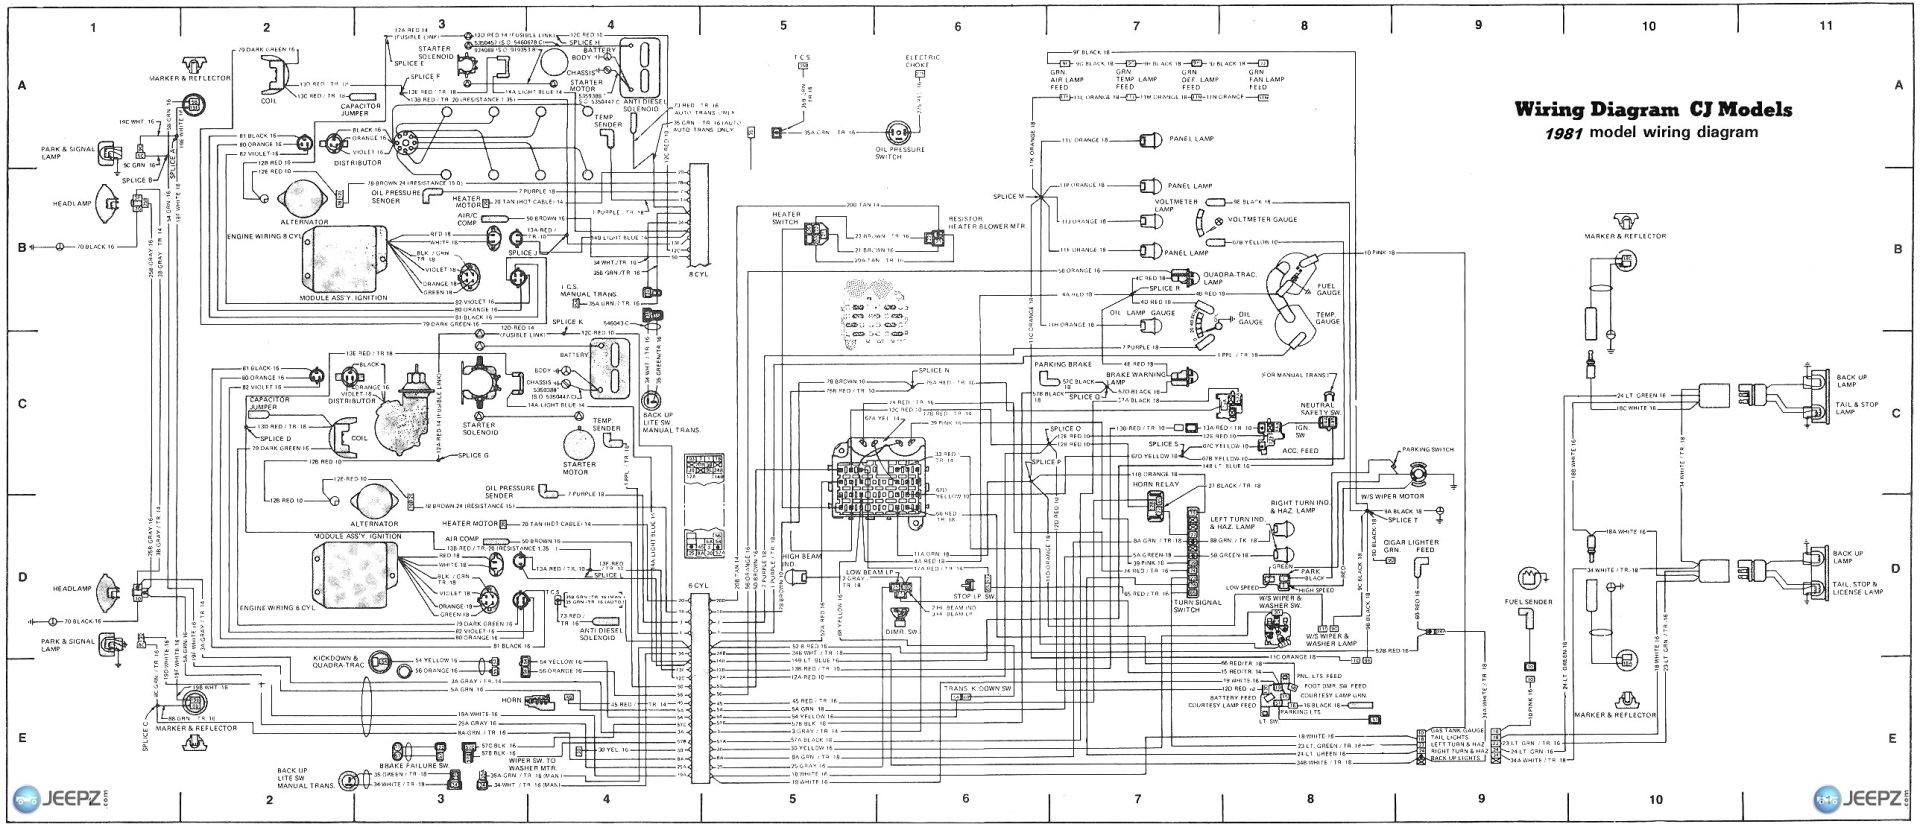 clark forklifts wiring diagrams 1997 library wiring diagram rh 20 edfer dominik suess de